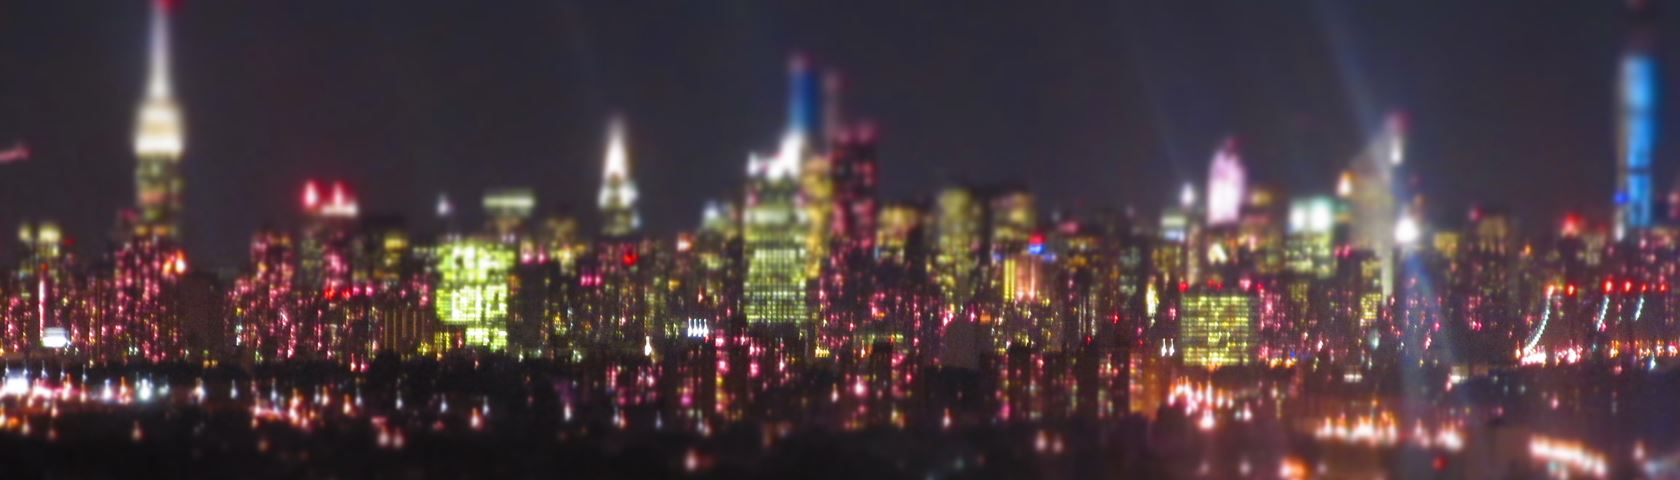 New York City Skyline - Infrared - Ultraviolet - Creative Camera Setting